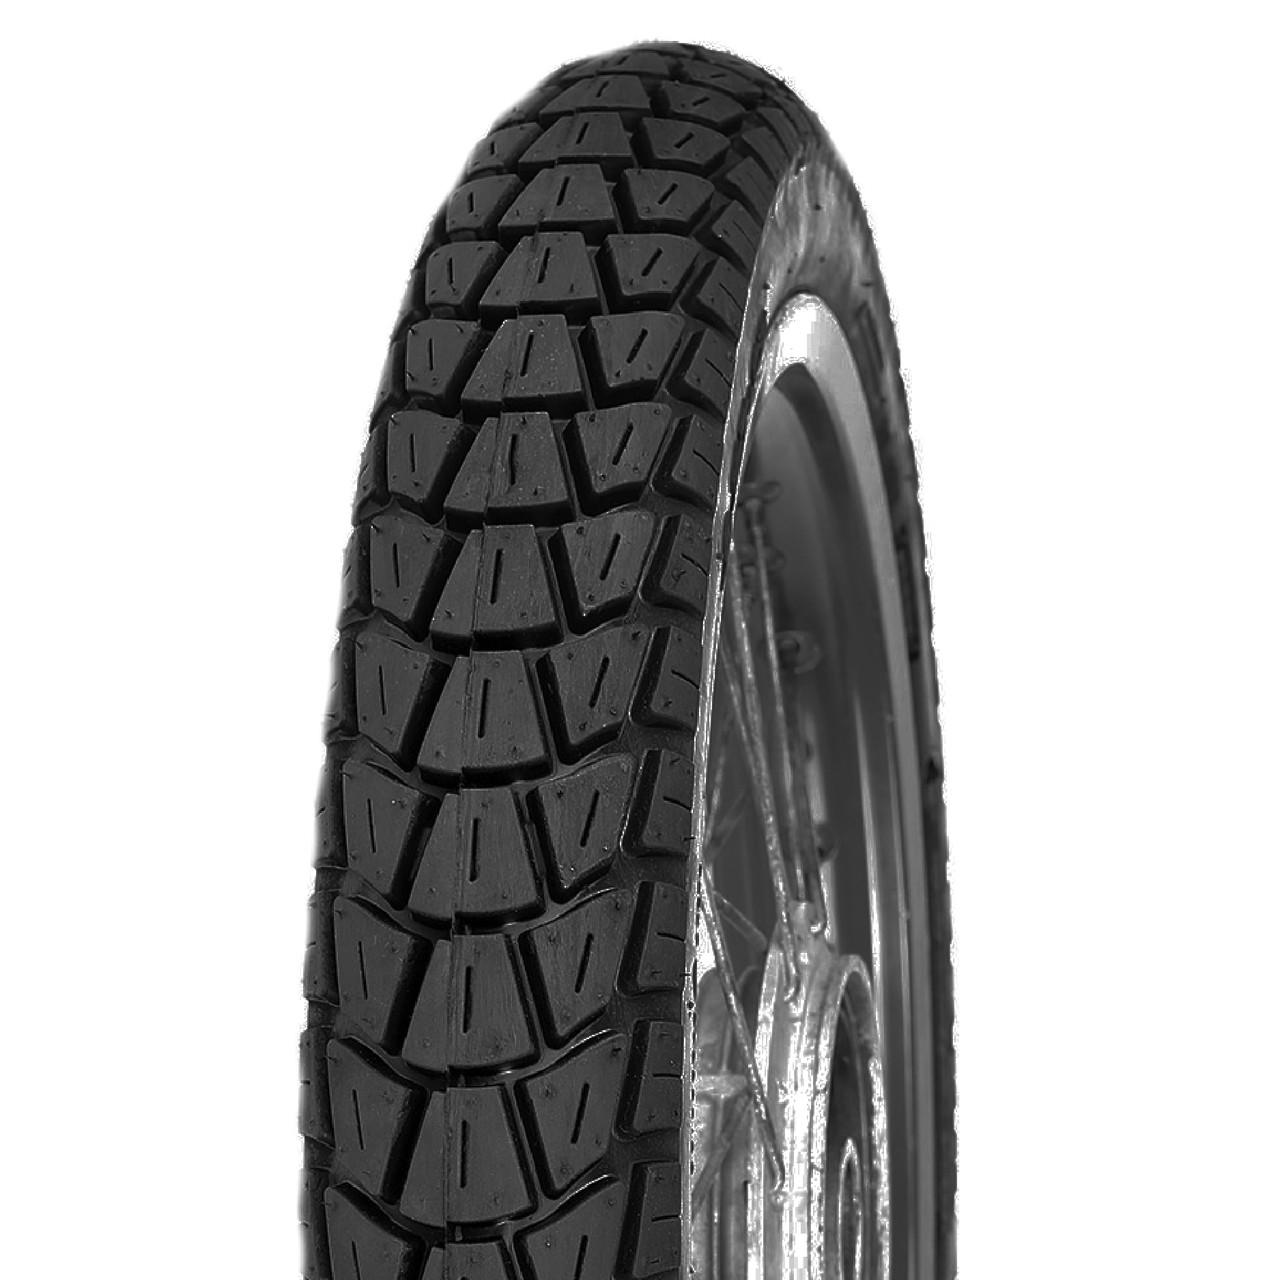 Покрышка для мотоцикла 2.50-17 Deli Tire S-228, TT